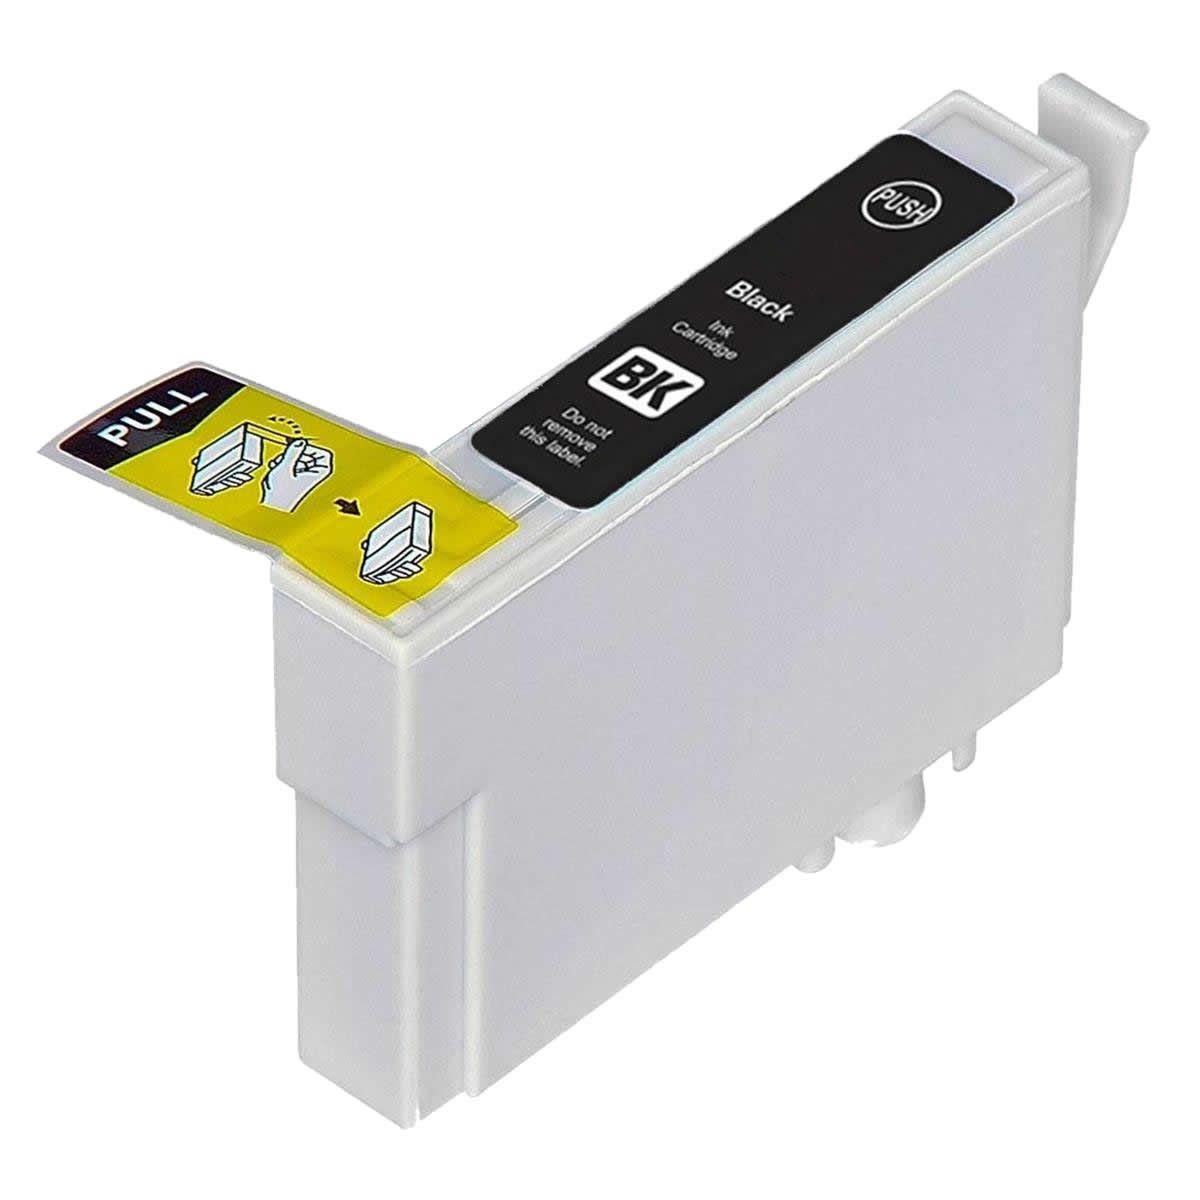 Cartucho Epson 133 Preto T1331 compativel para TX235W TX420W TX430W TX320F